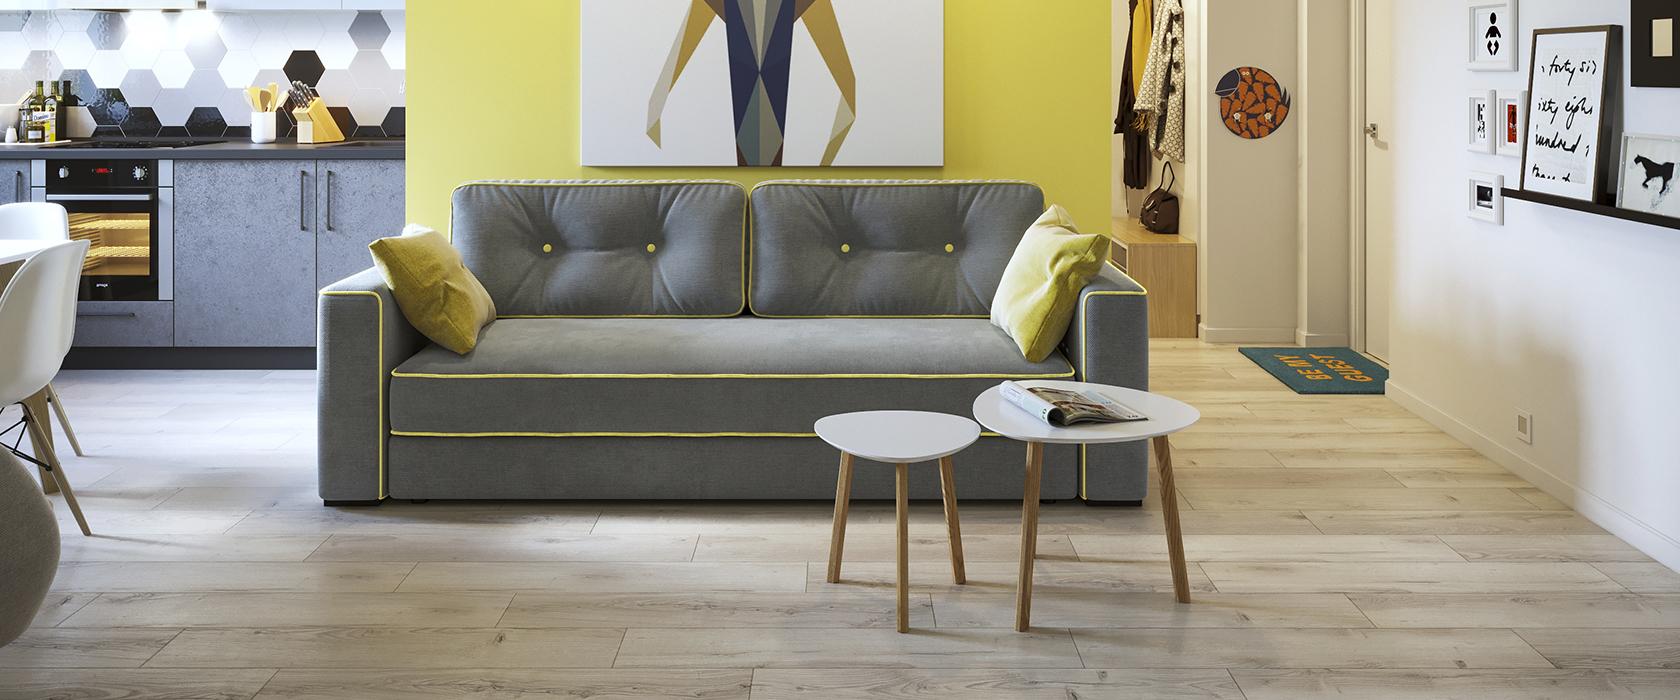 Трехместный диван Silvio - Фото 1 - Pufetto